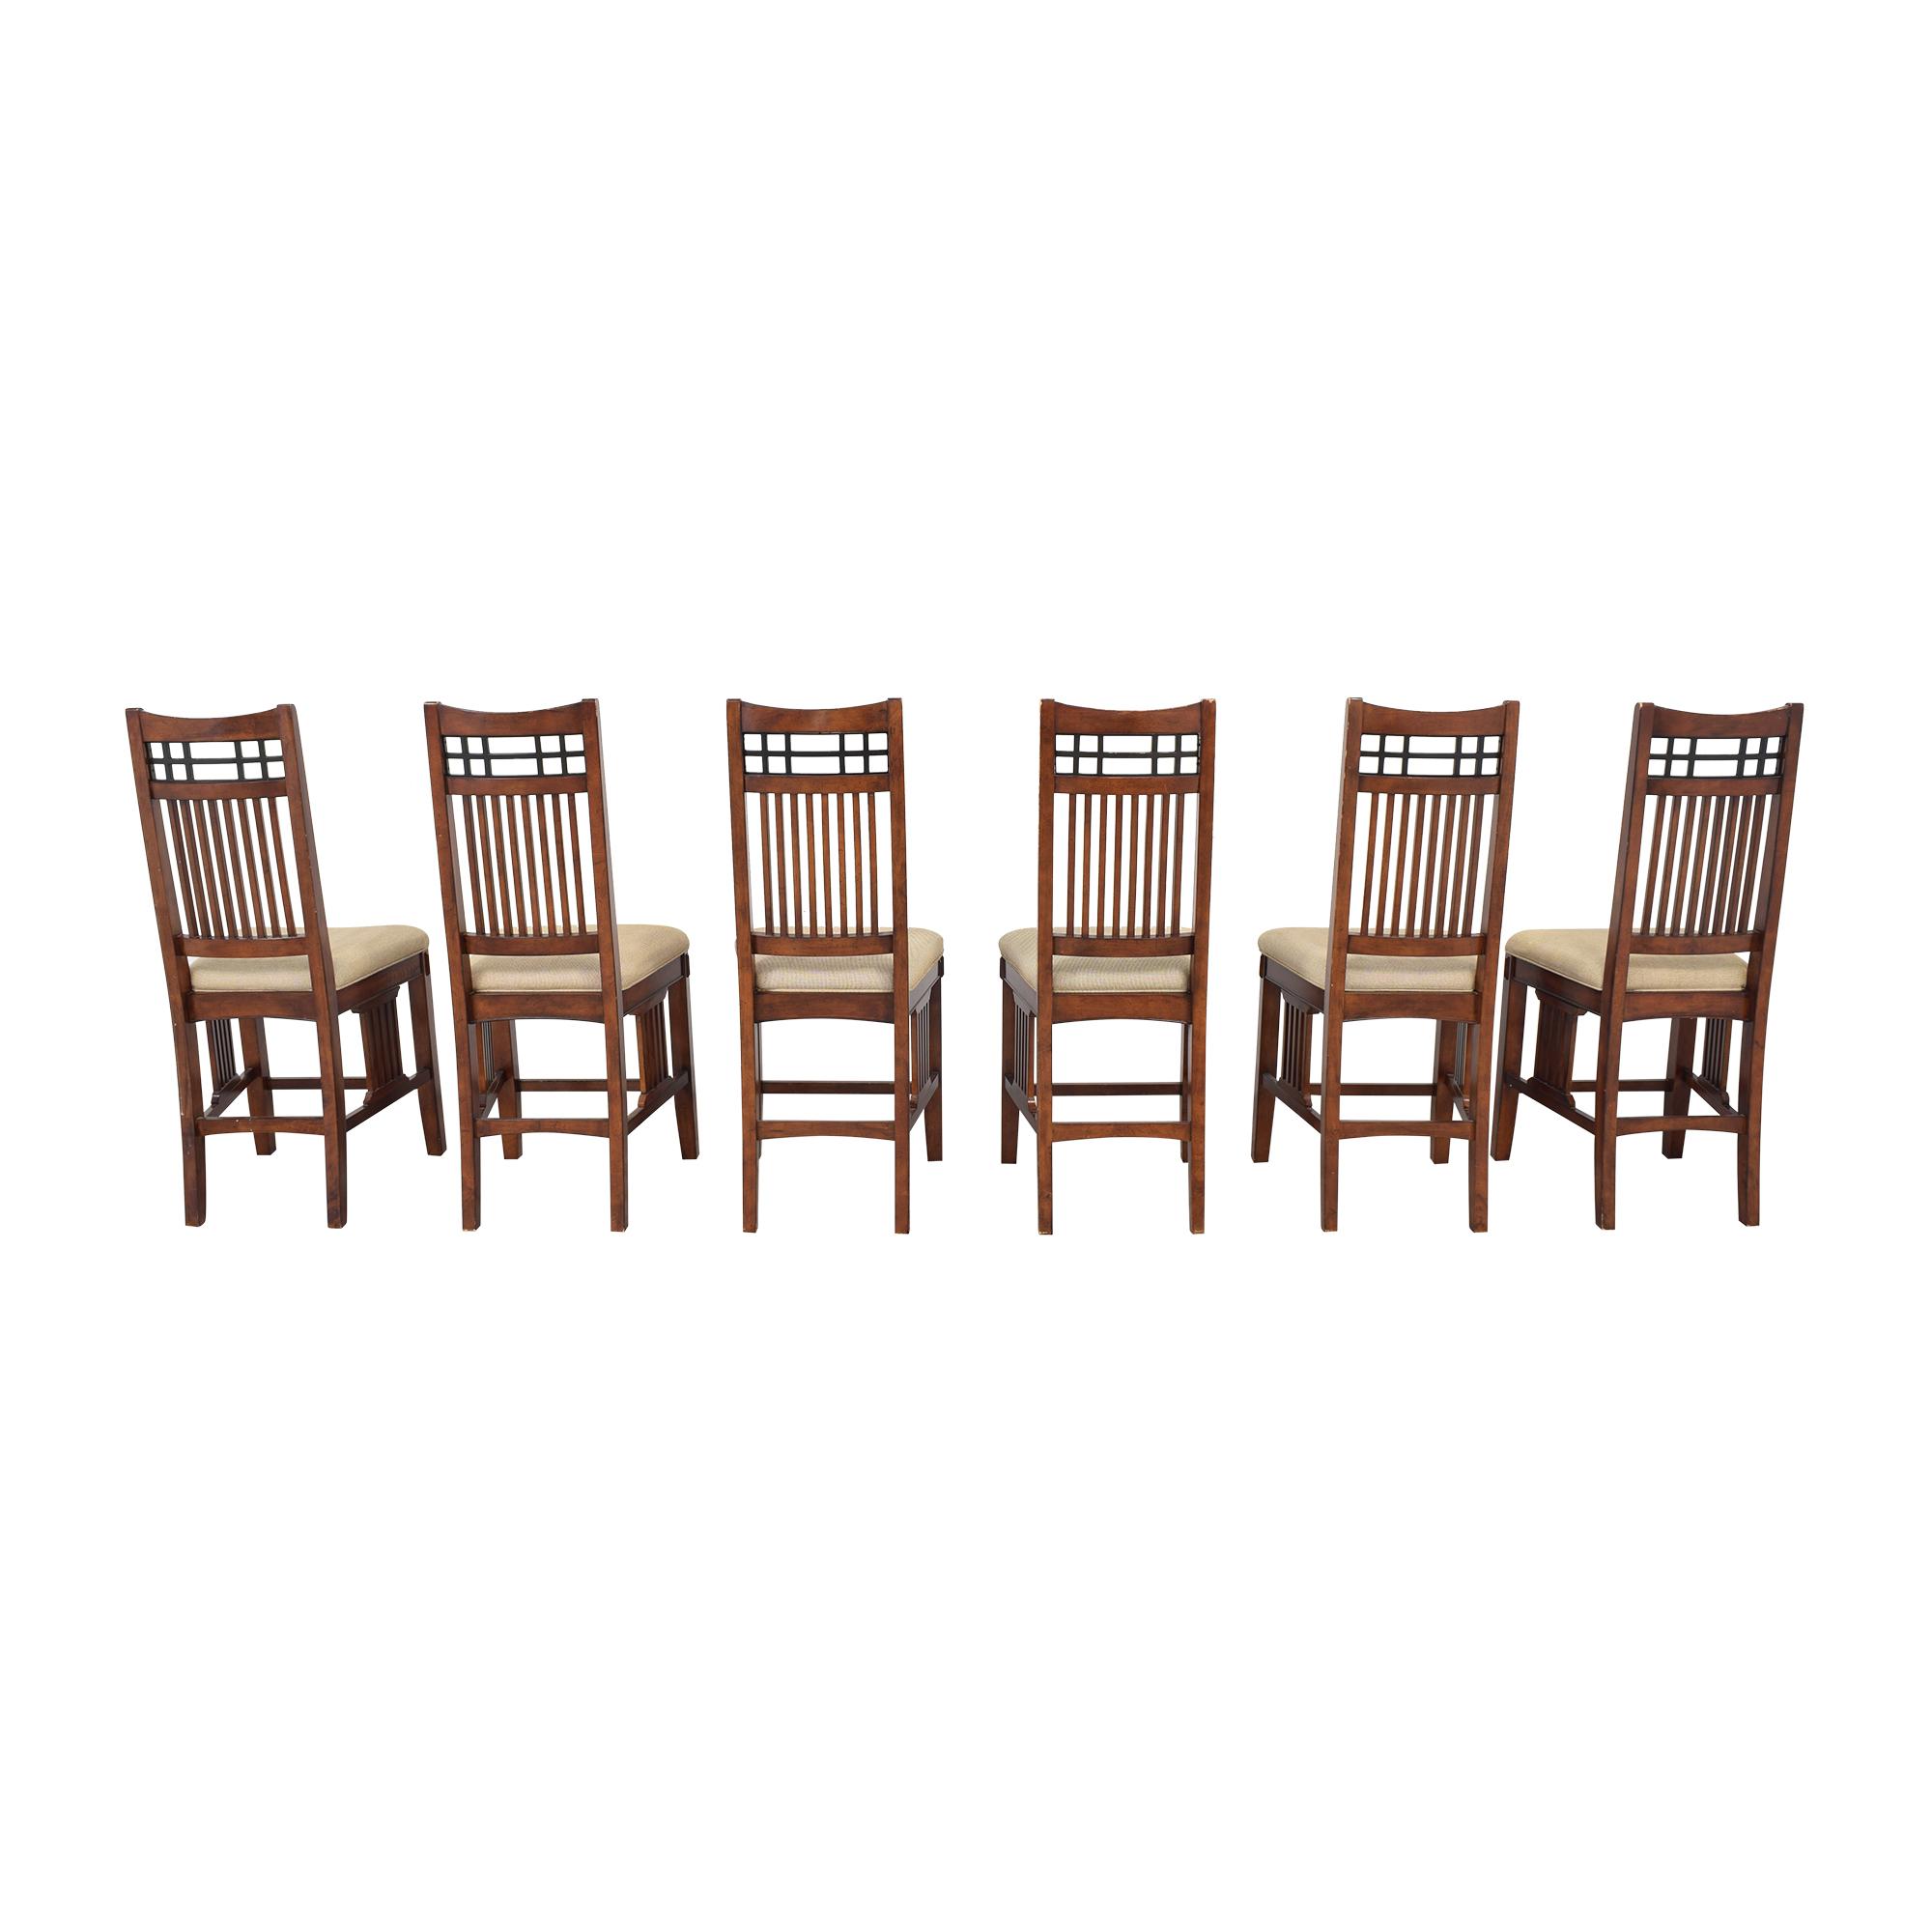 Broyhill Furniture Broyhill Vantana Upholstered Chairs second hand